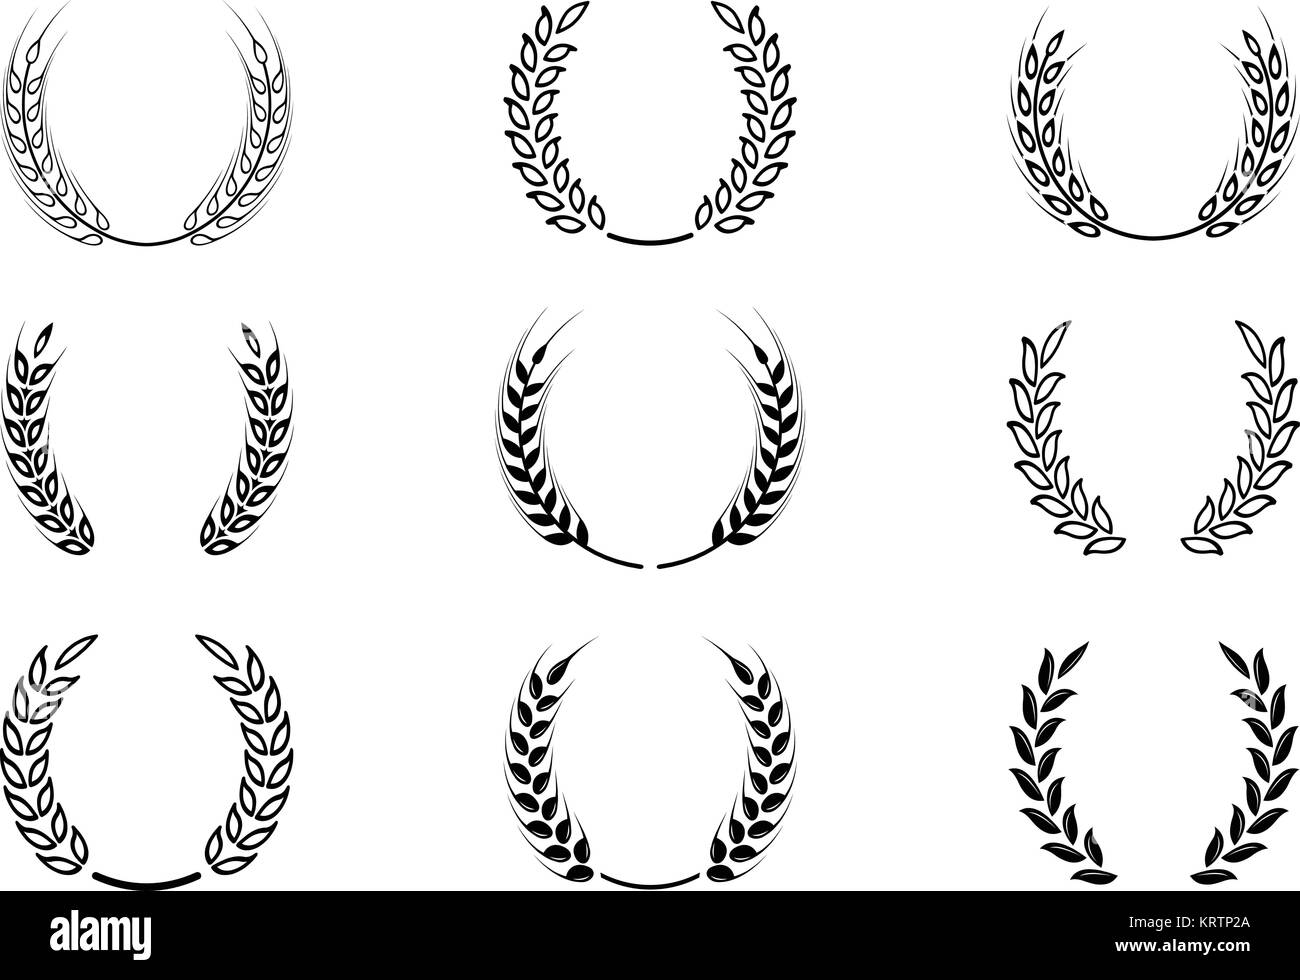 Black Laurel Wreath A Symbol Of The Winner Wheat Ears Or Rice